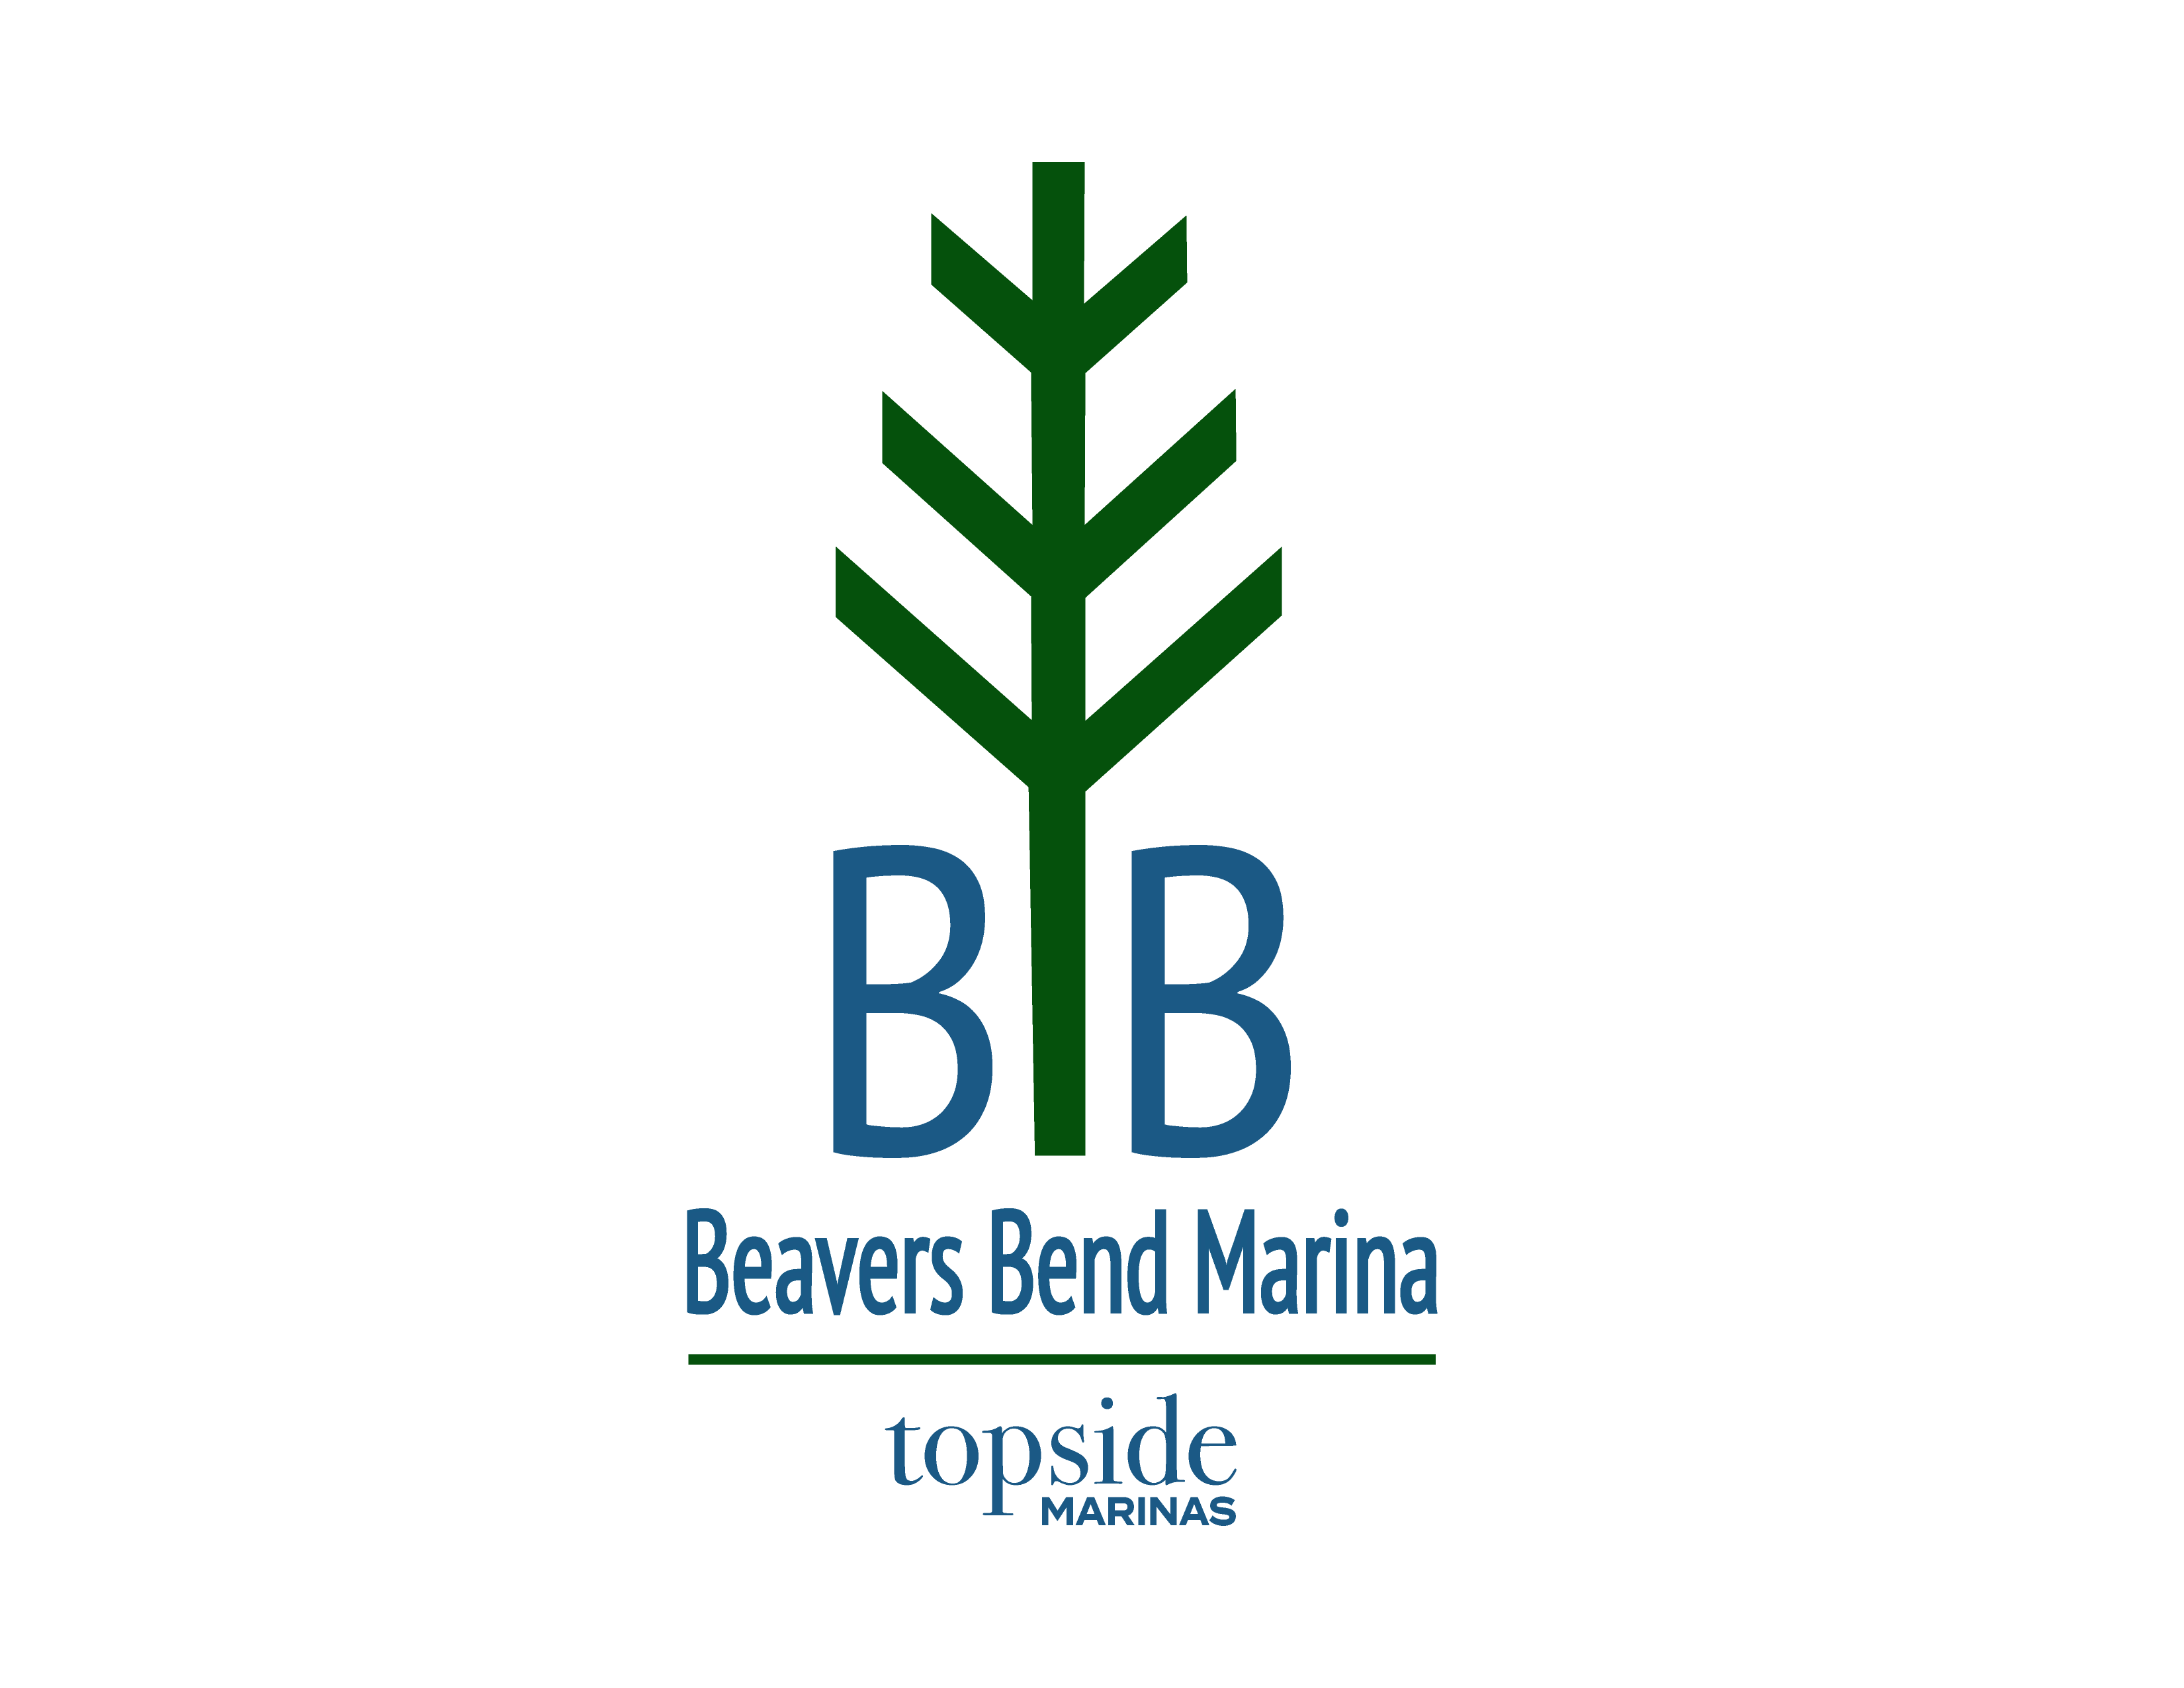 Beavers Bend Marina, A TopSide Marina